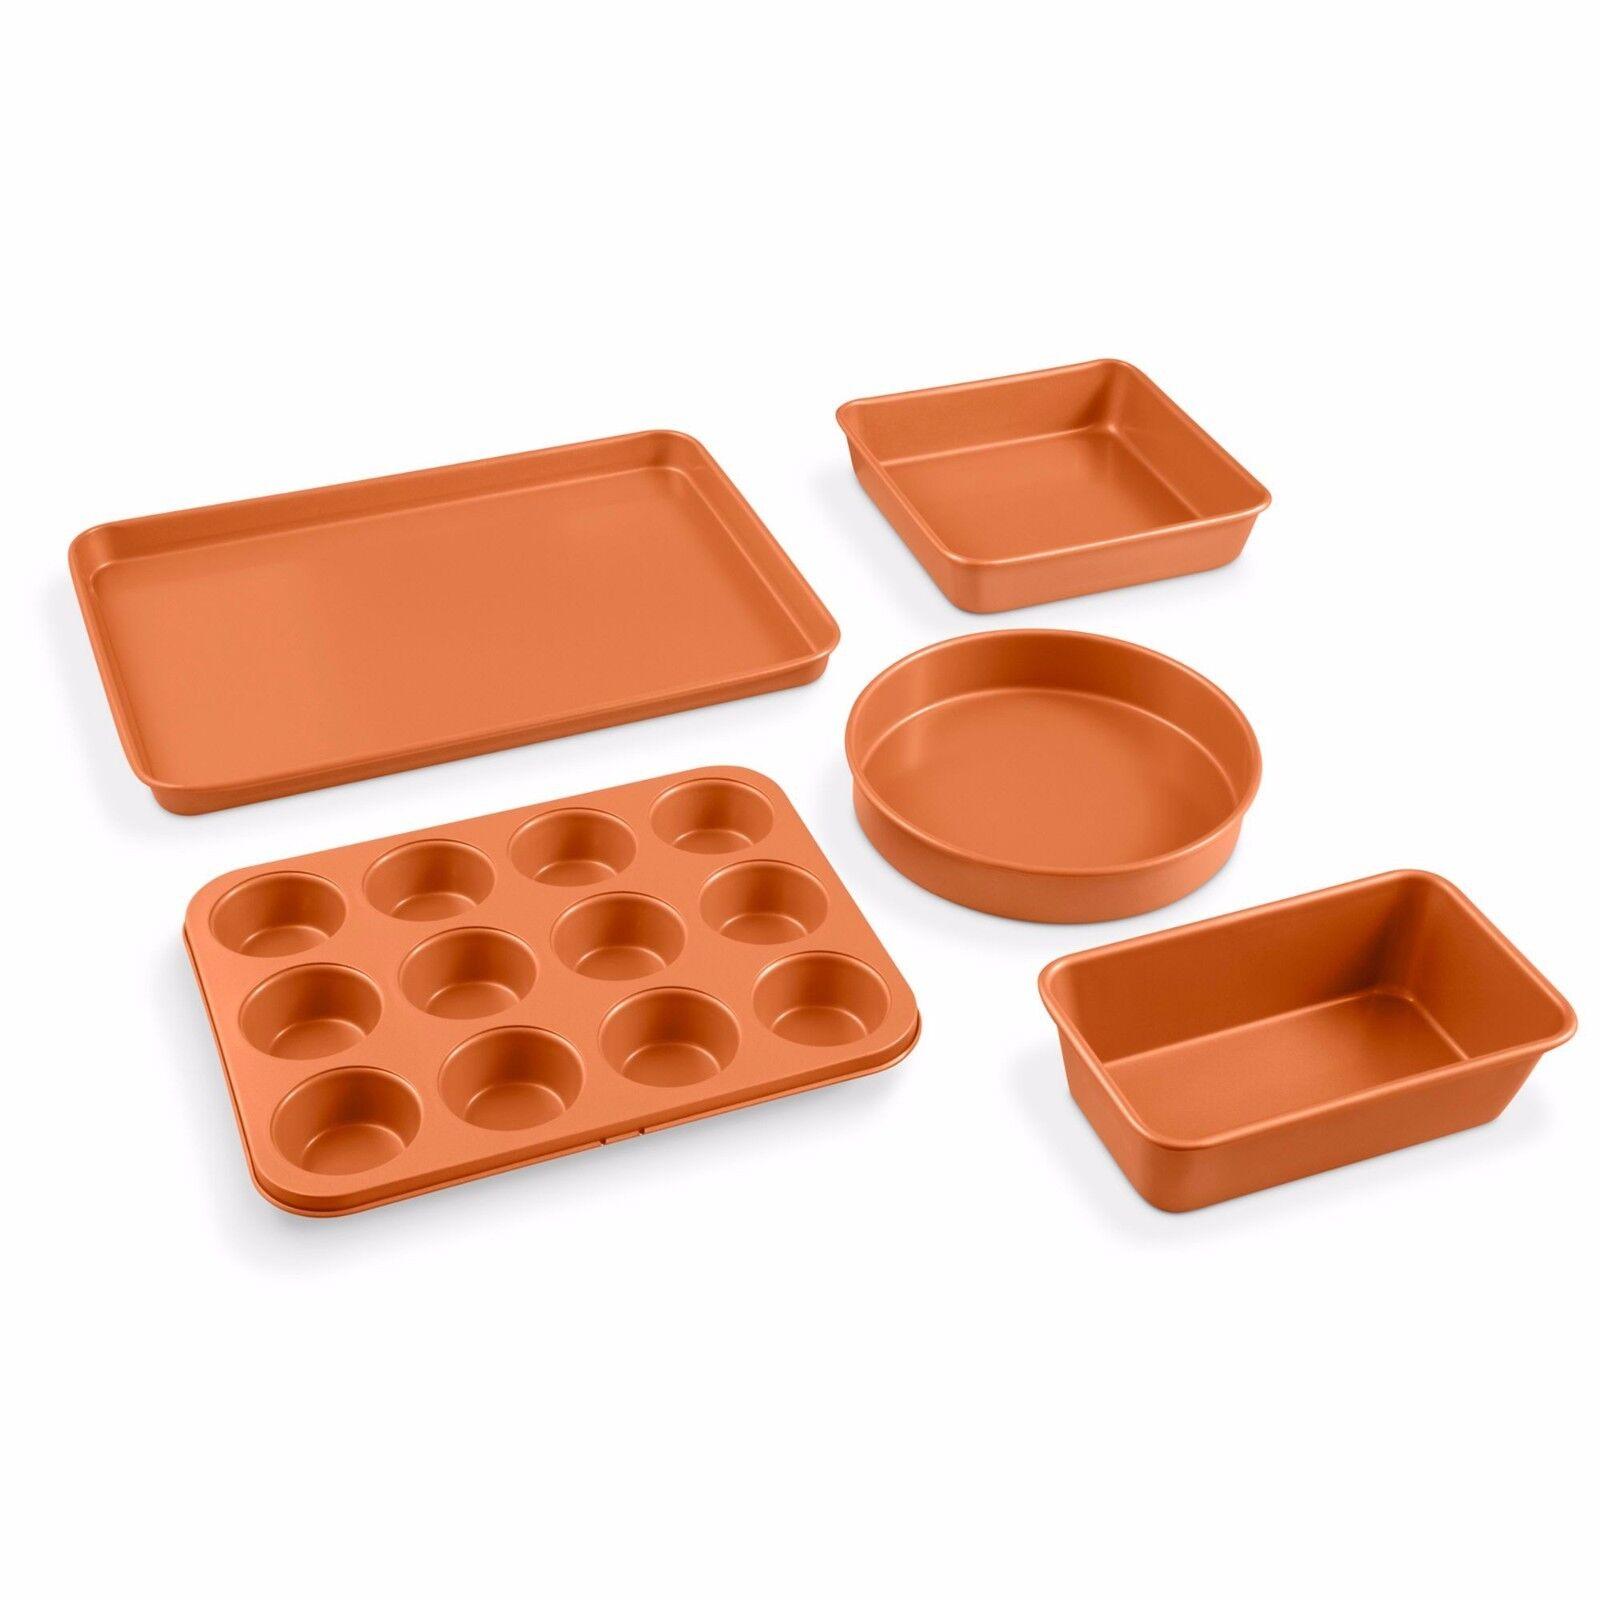 Gotham Steel Copper Nonstick Bakeware - Baking Pans, Cookie